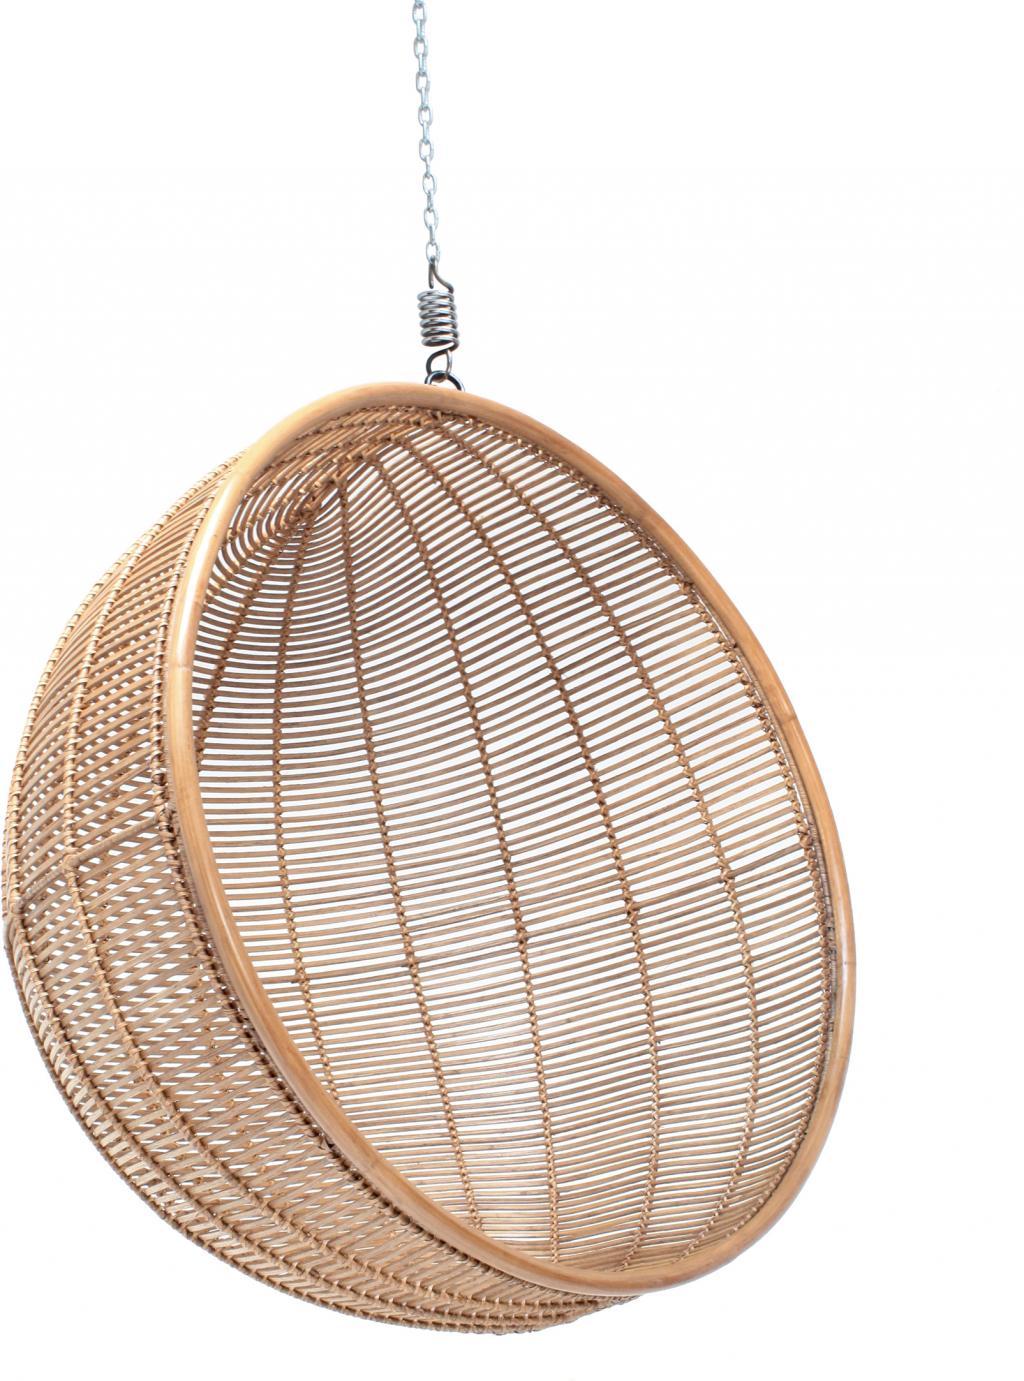 h ngesessel ball naturell rattan hk living kaufen wohn und. Black Bedroom Furniture Sets. Home Design Ideas